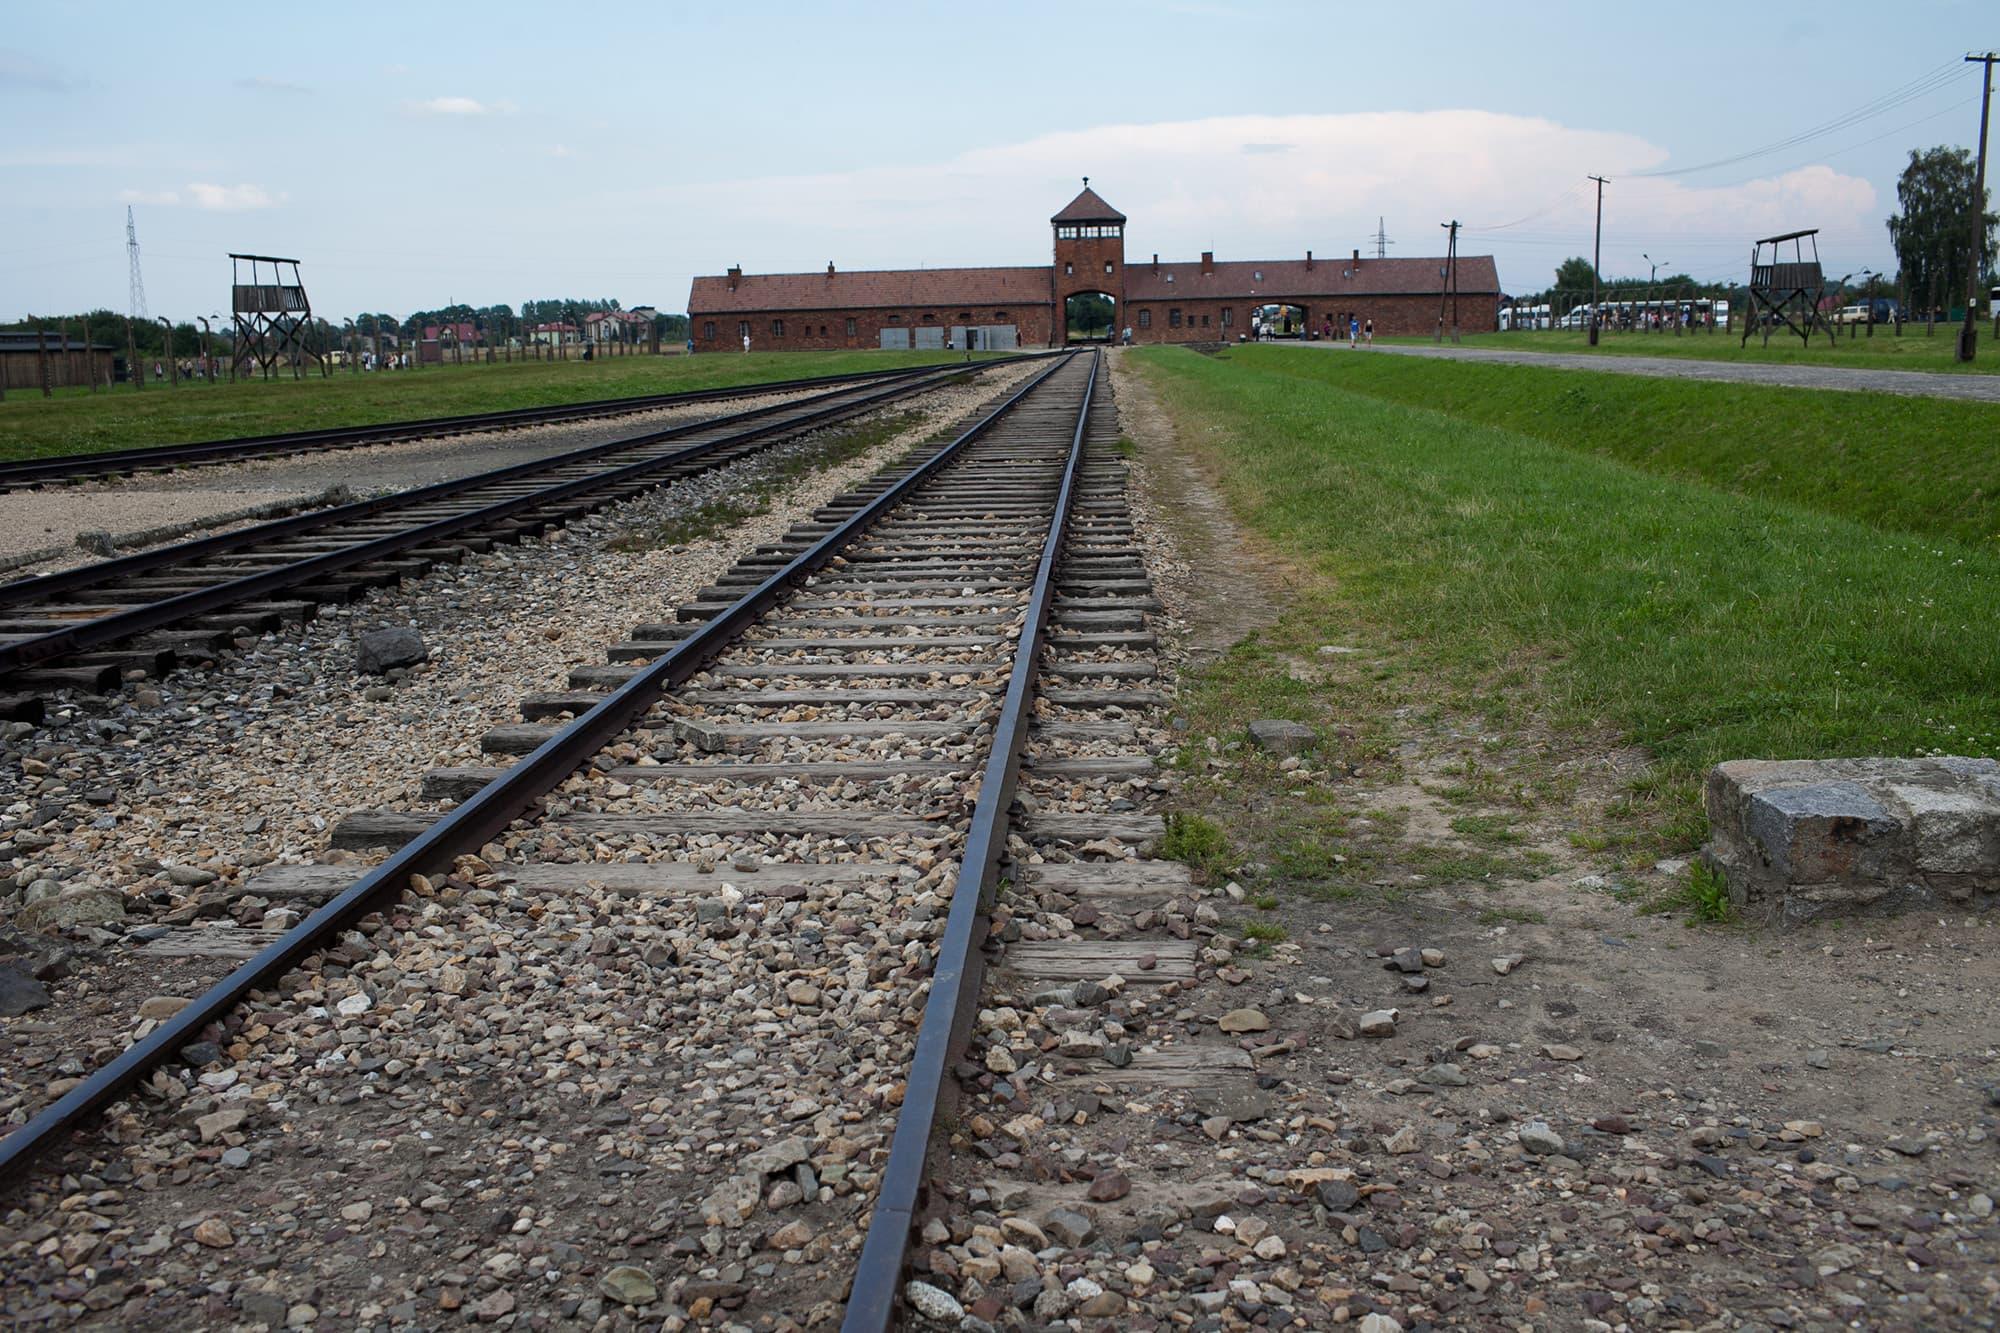 Auschwitz-Birkenau Memorial and State Museum.